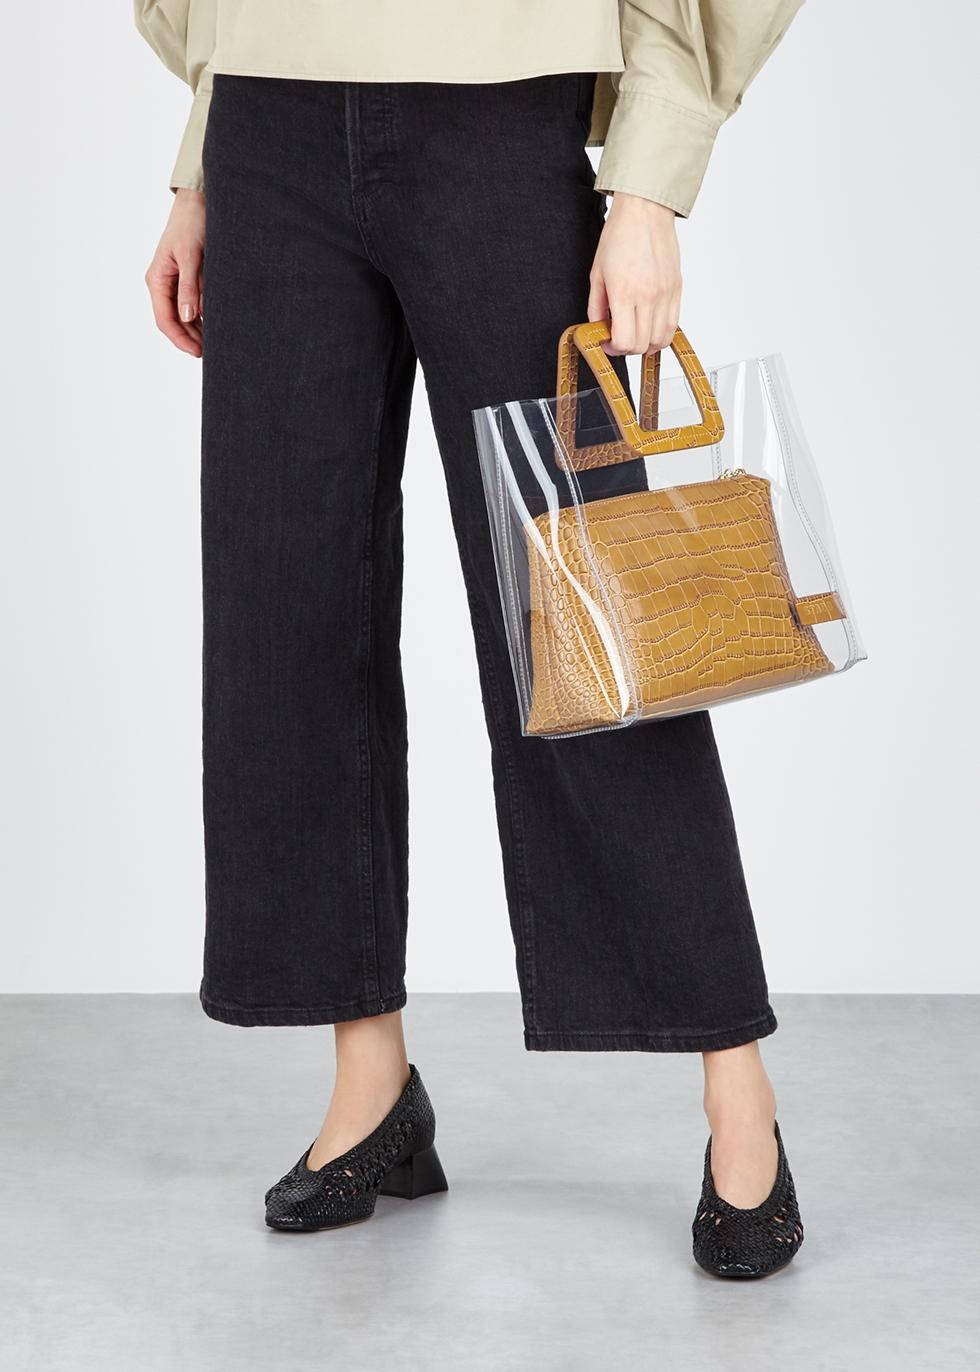 Women s Designer Bags ea94a055c3f67